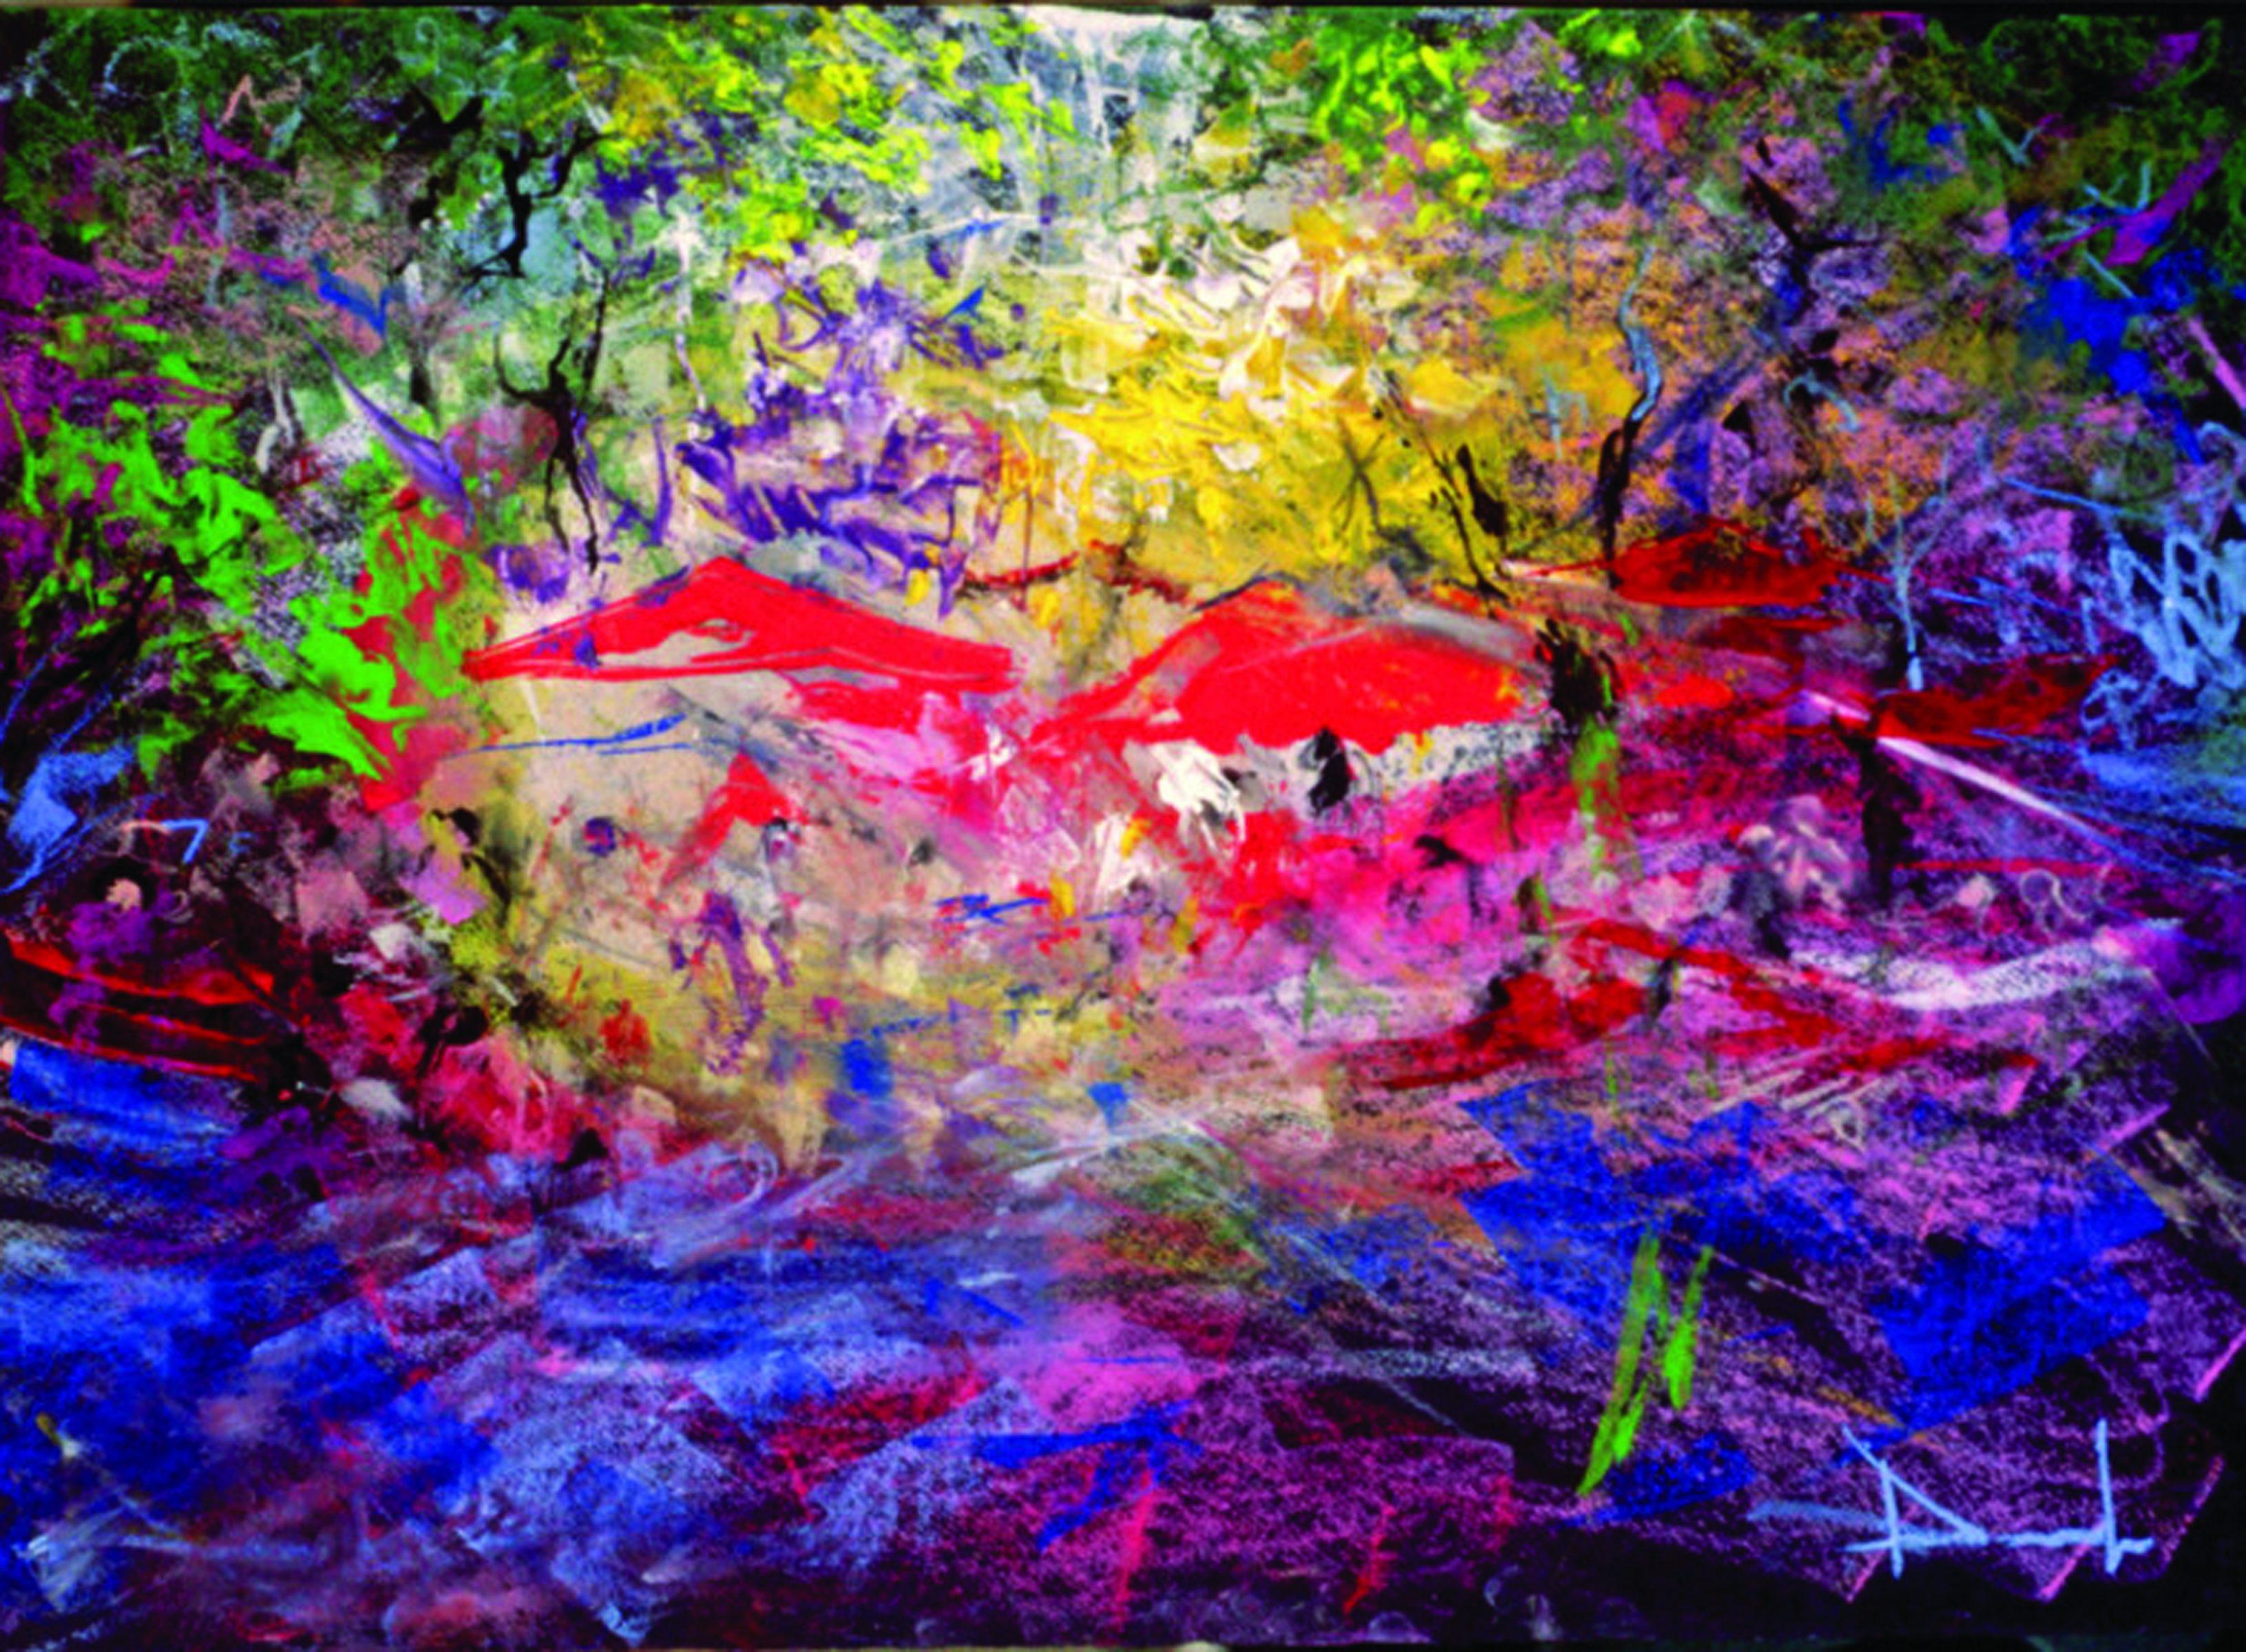 01_gallery-mercati-luci-1024x576.jpg